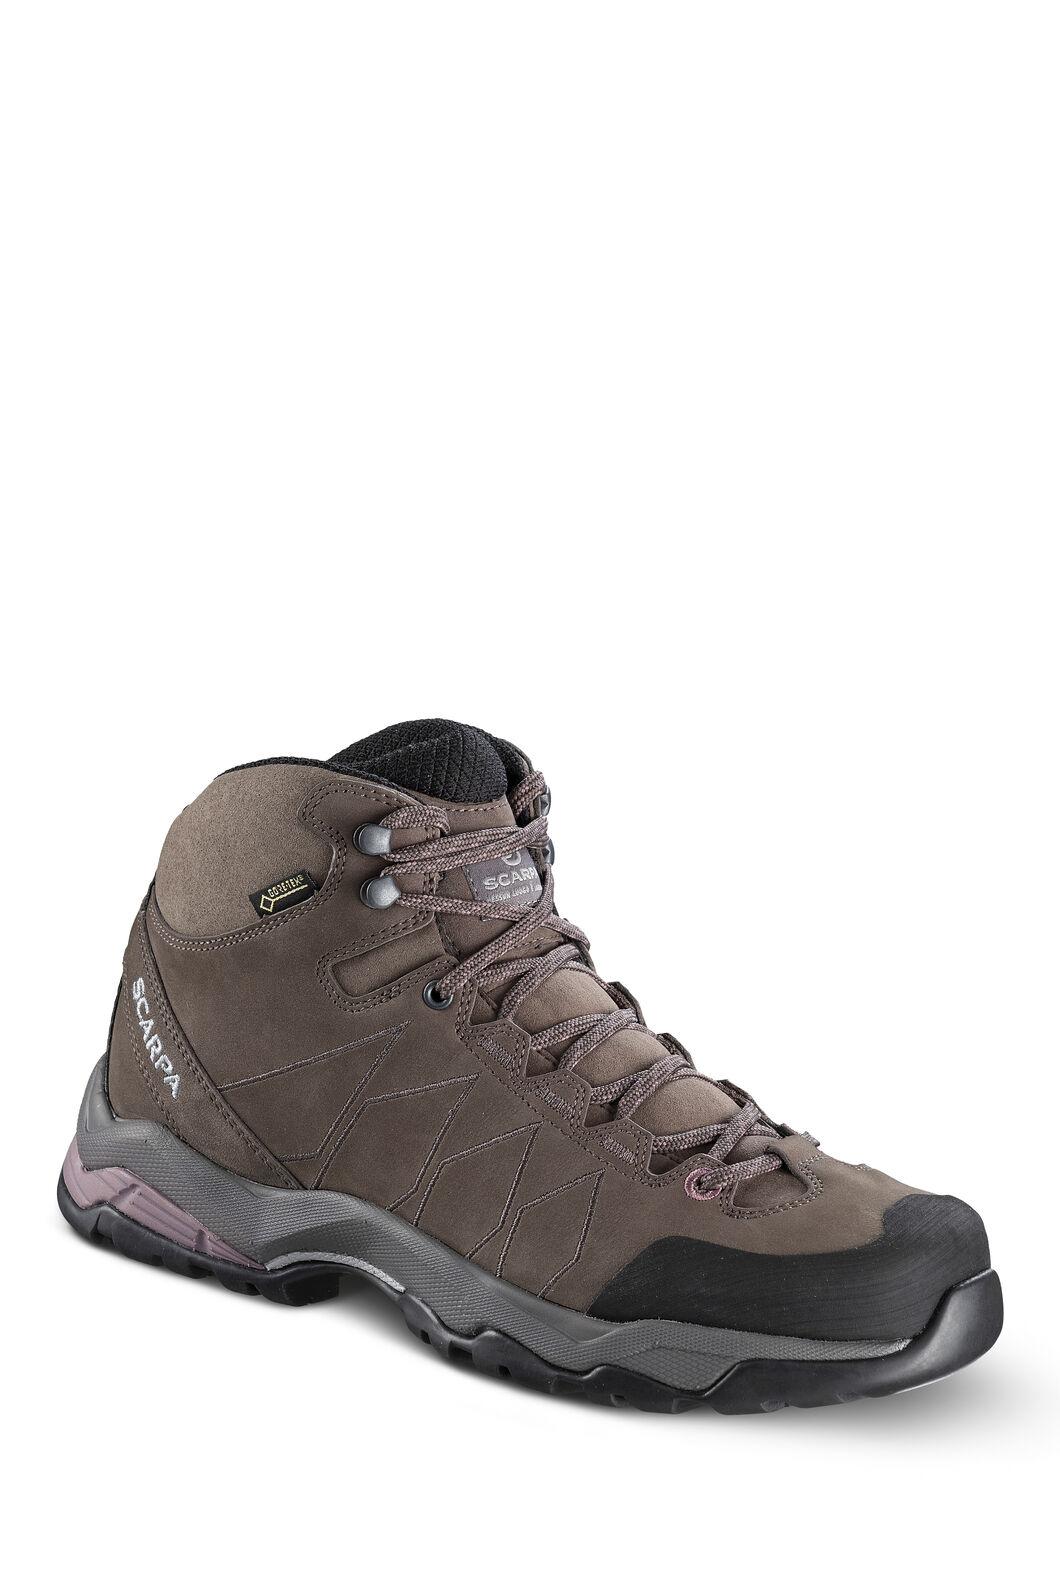 Scarpa Women's Moraine Plus GTX Hiking Boots, Charcoal/Dark Plum, hi-res